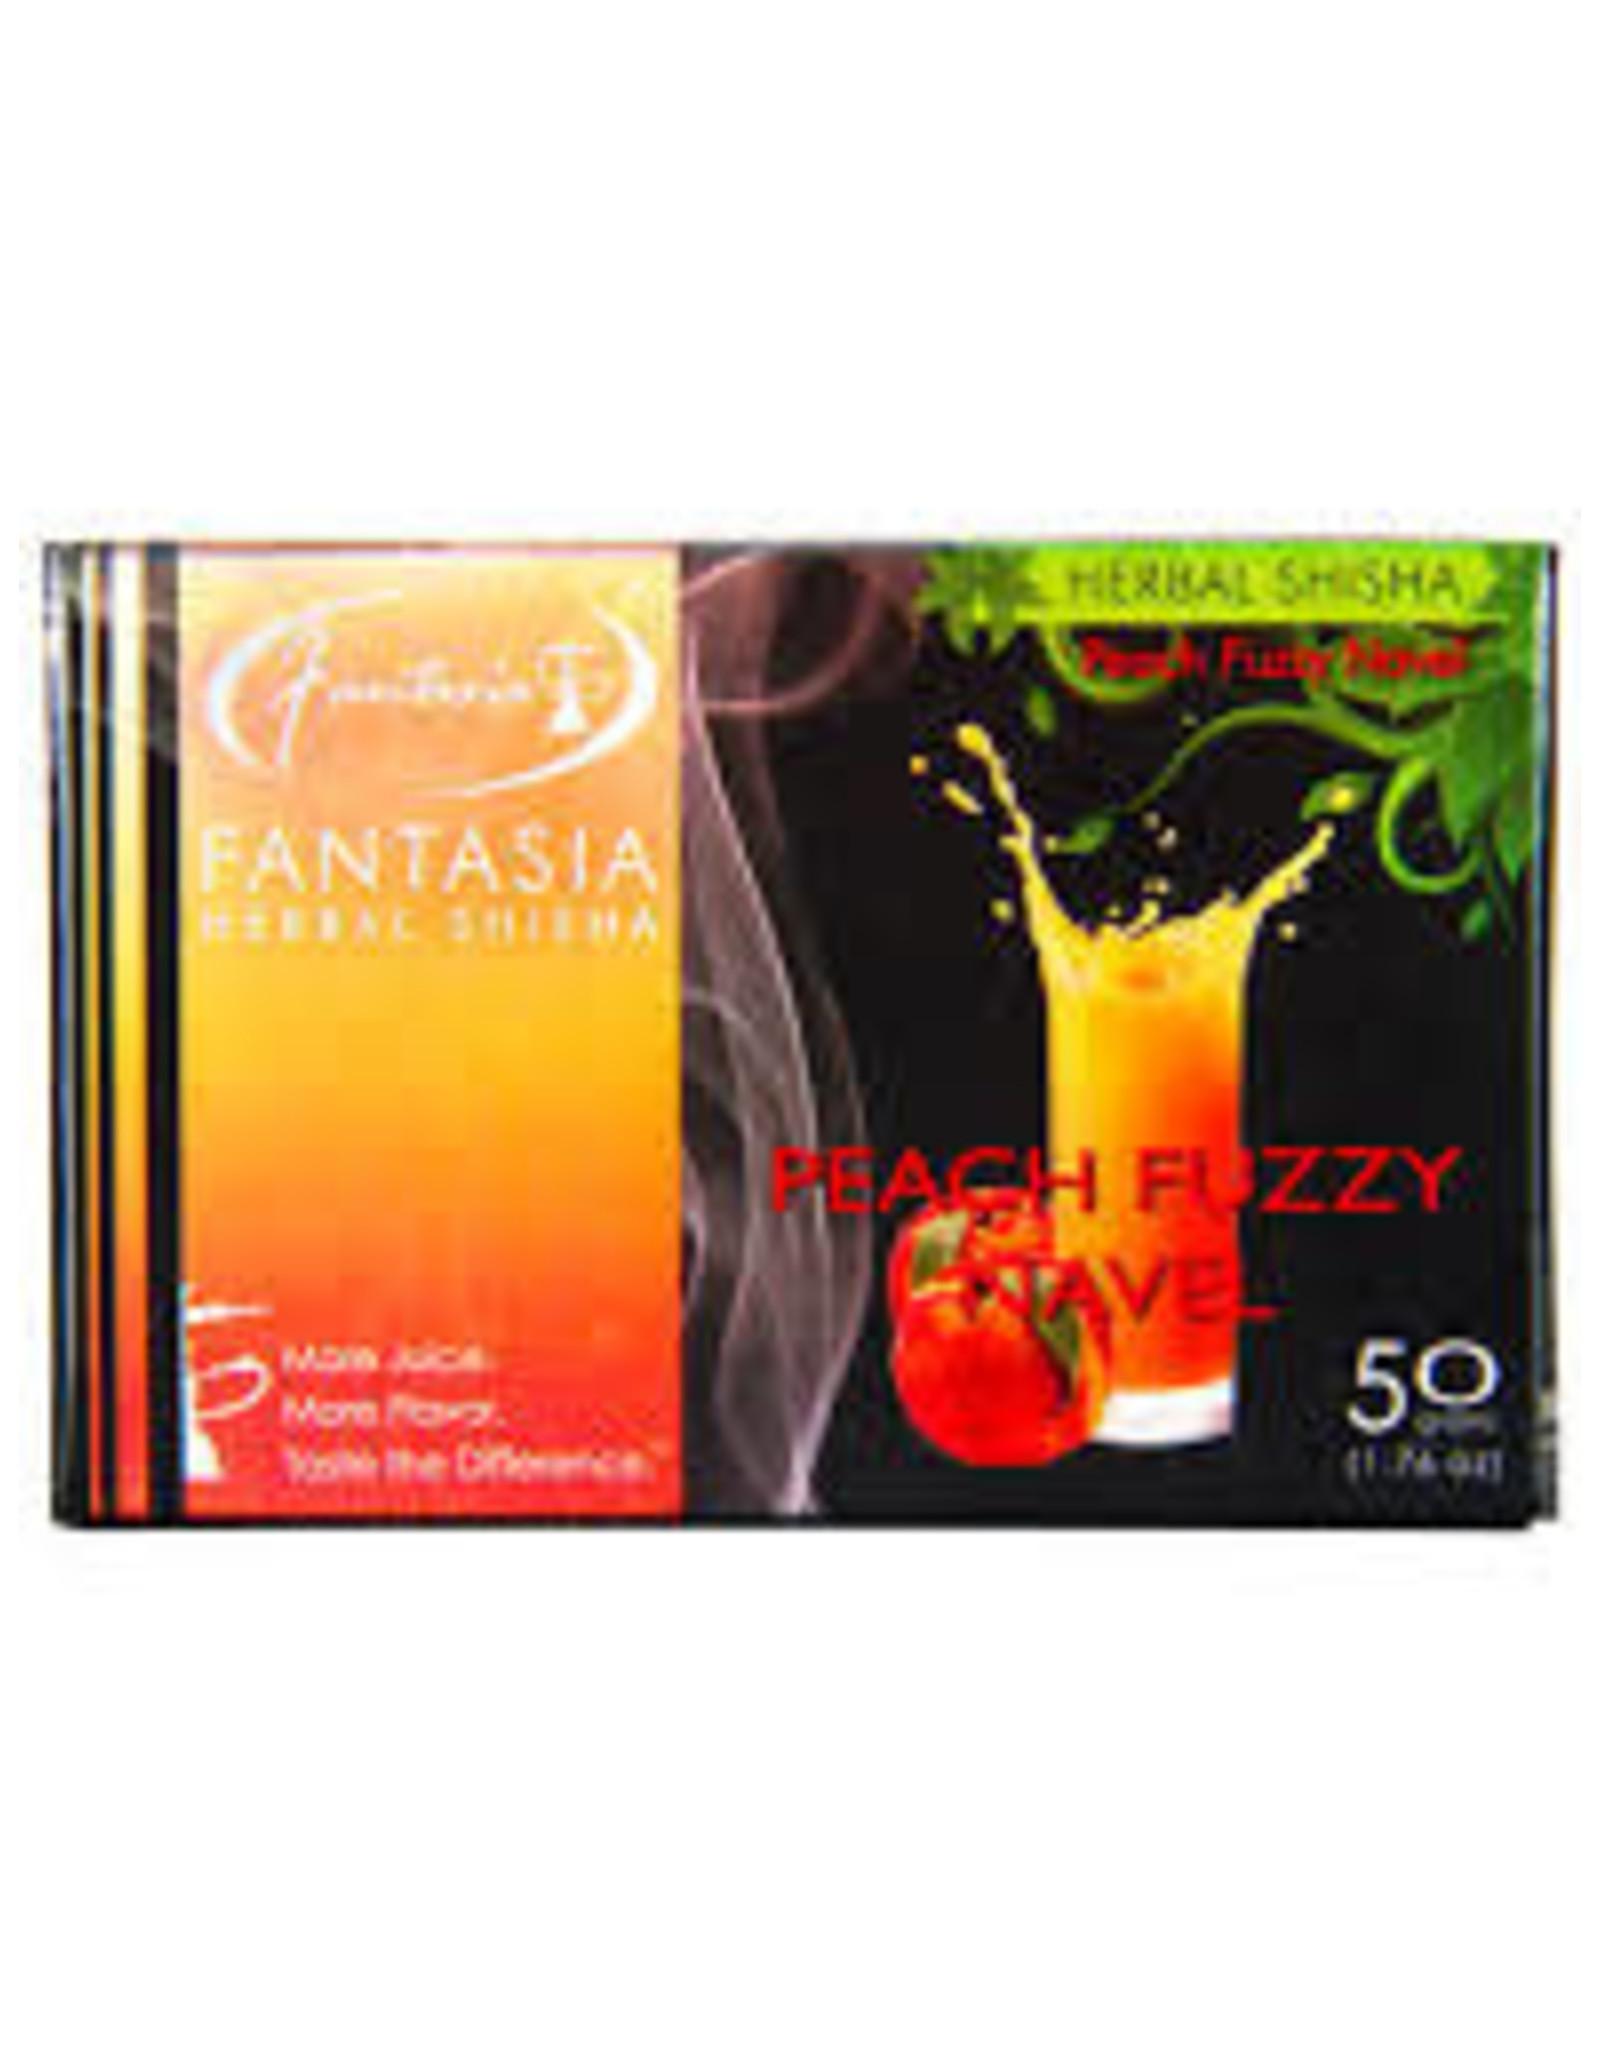 50g Fantasia Herbal Shisha Peach Fuzzy Nav